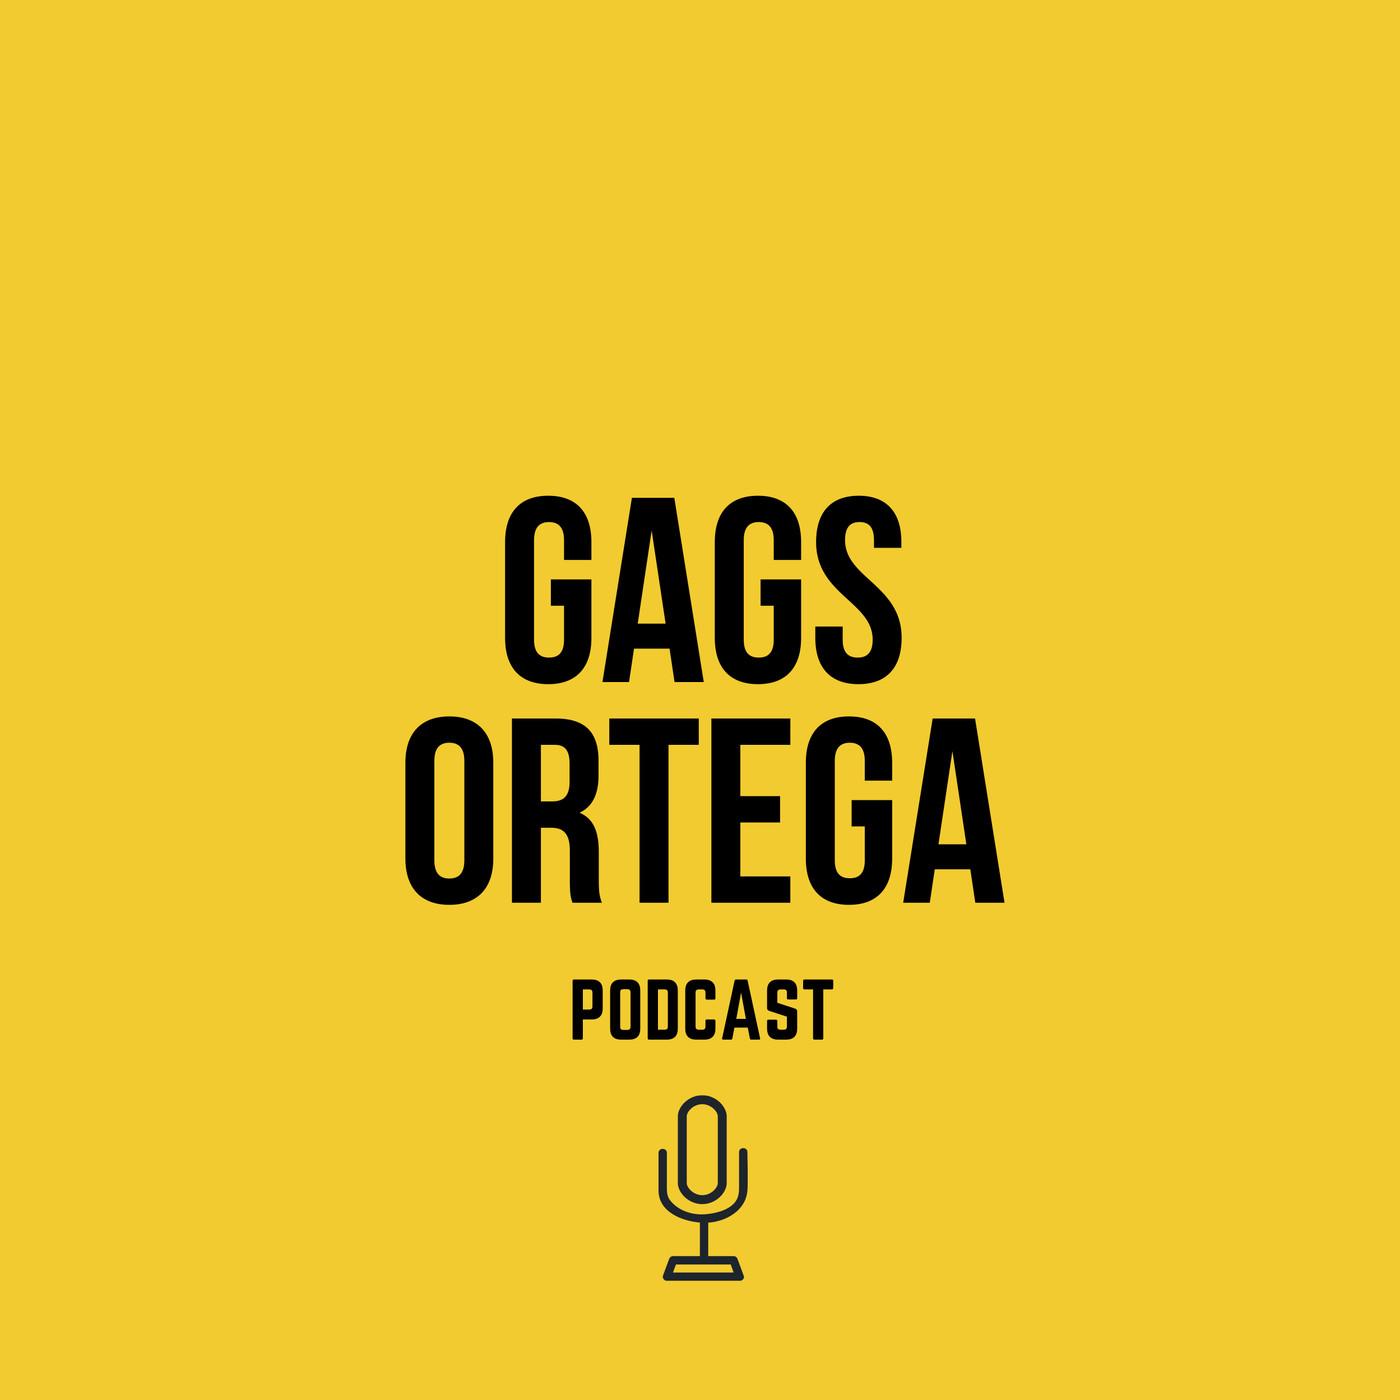 <![CDATA[Gags Ortega Podcast]]>